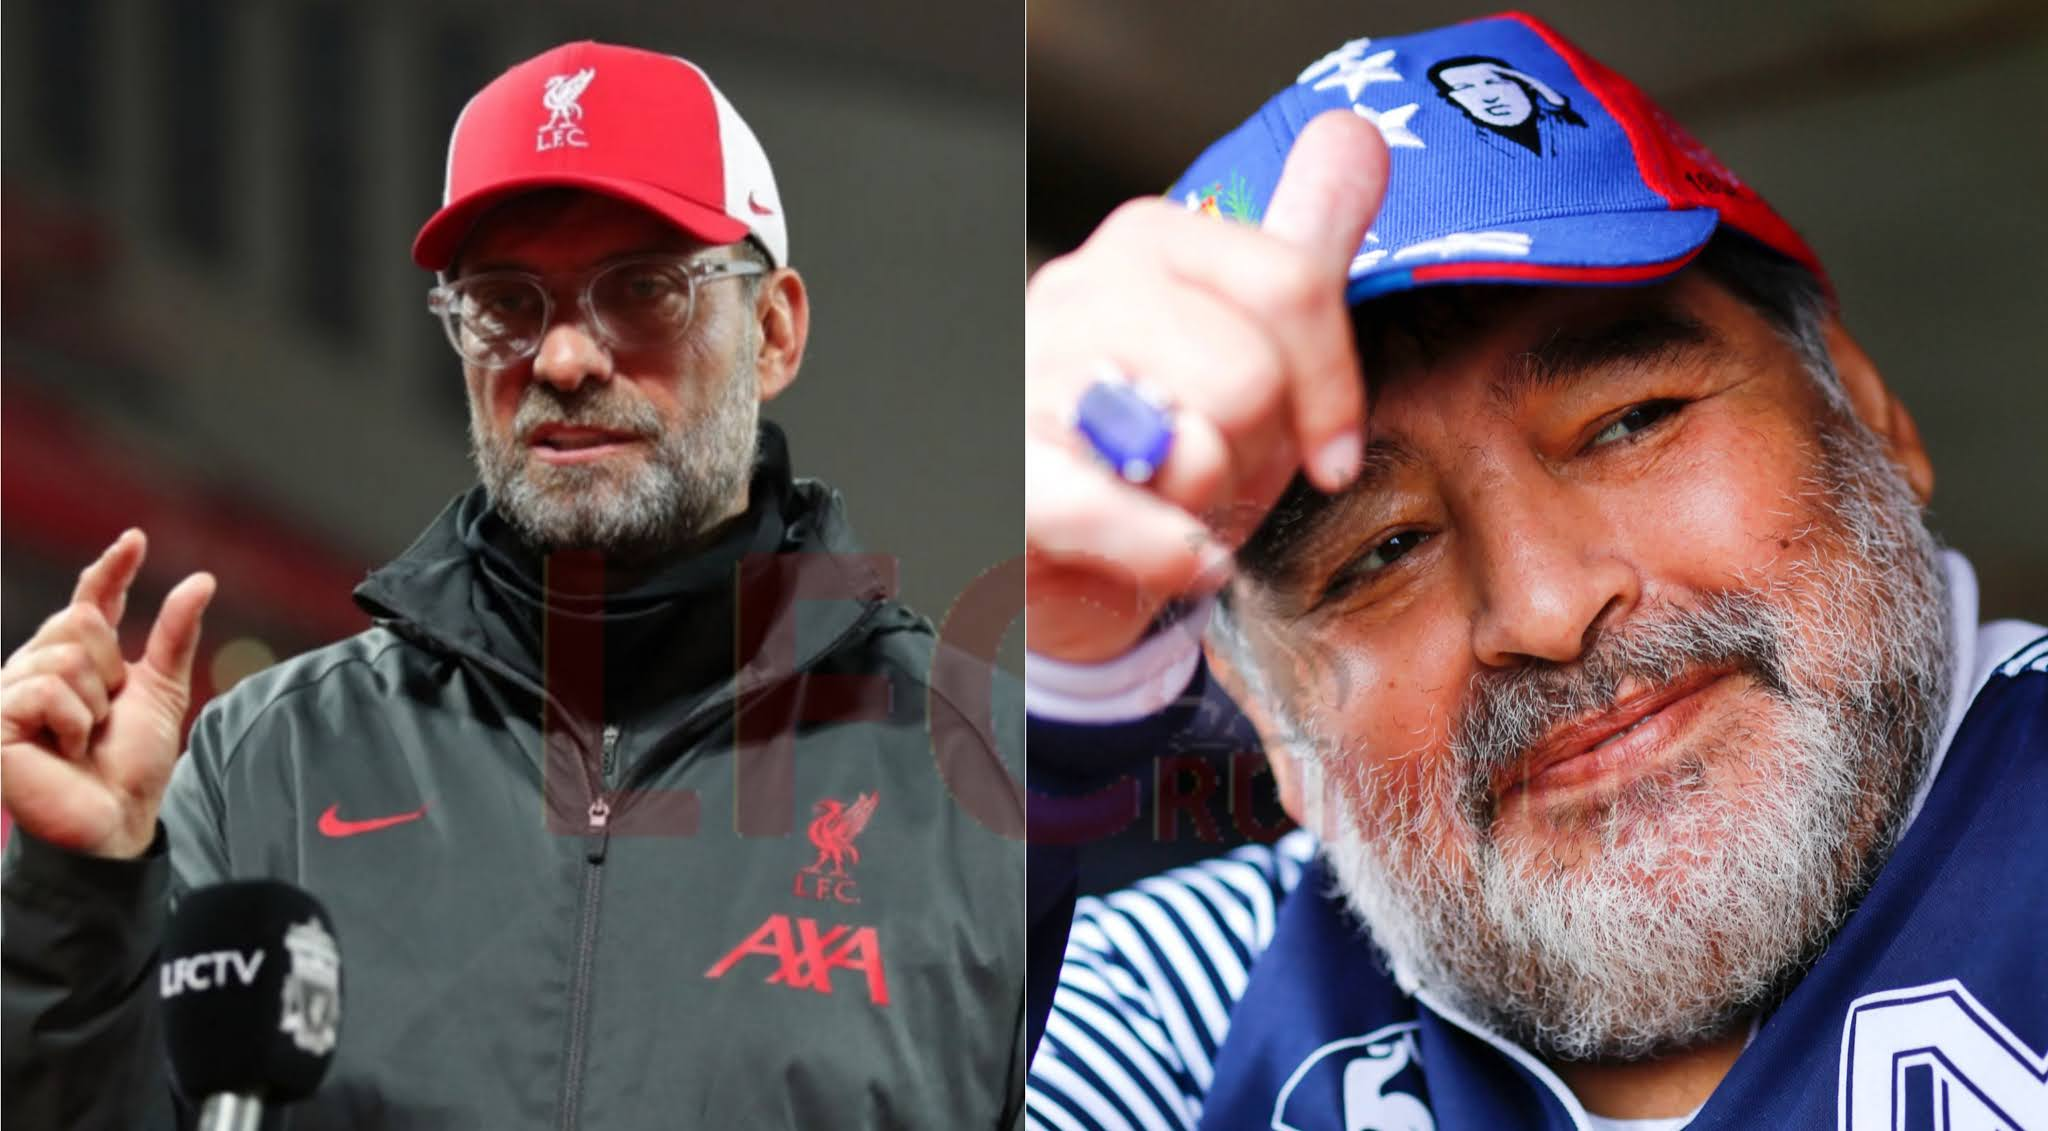 Jurgen Klopp's tribute to Diego Maradona